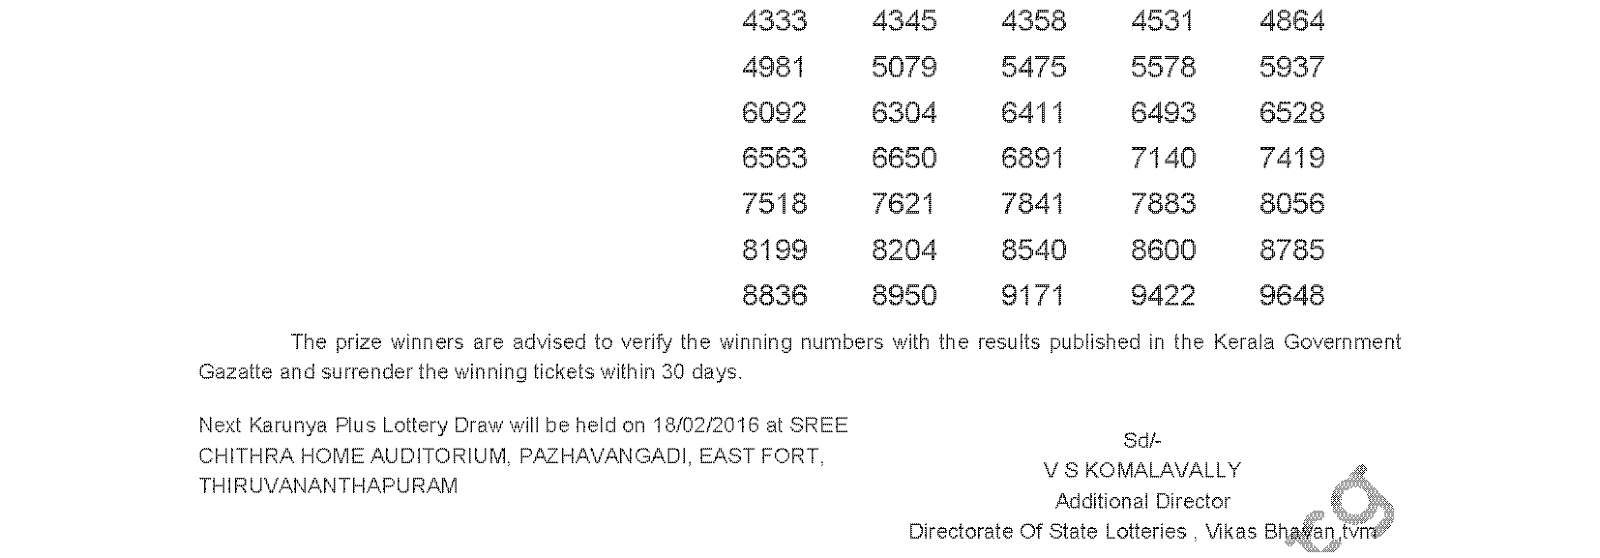 Karunya Plus Lottery KN 96 Result 11-02-2016